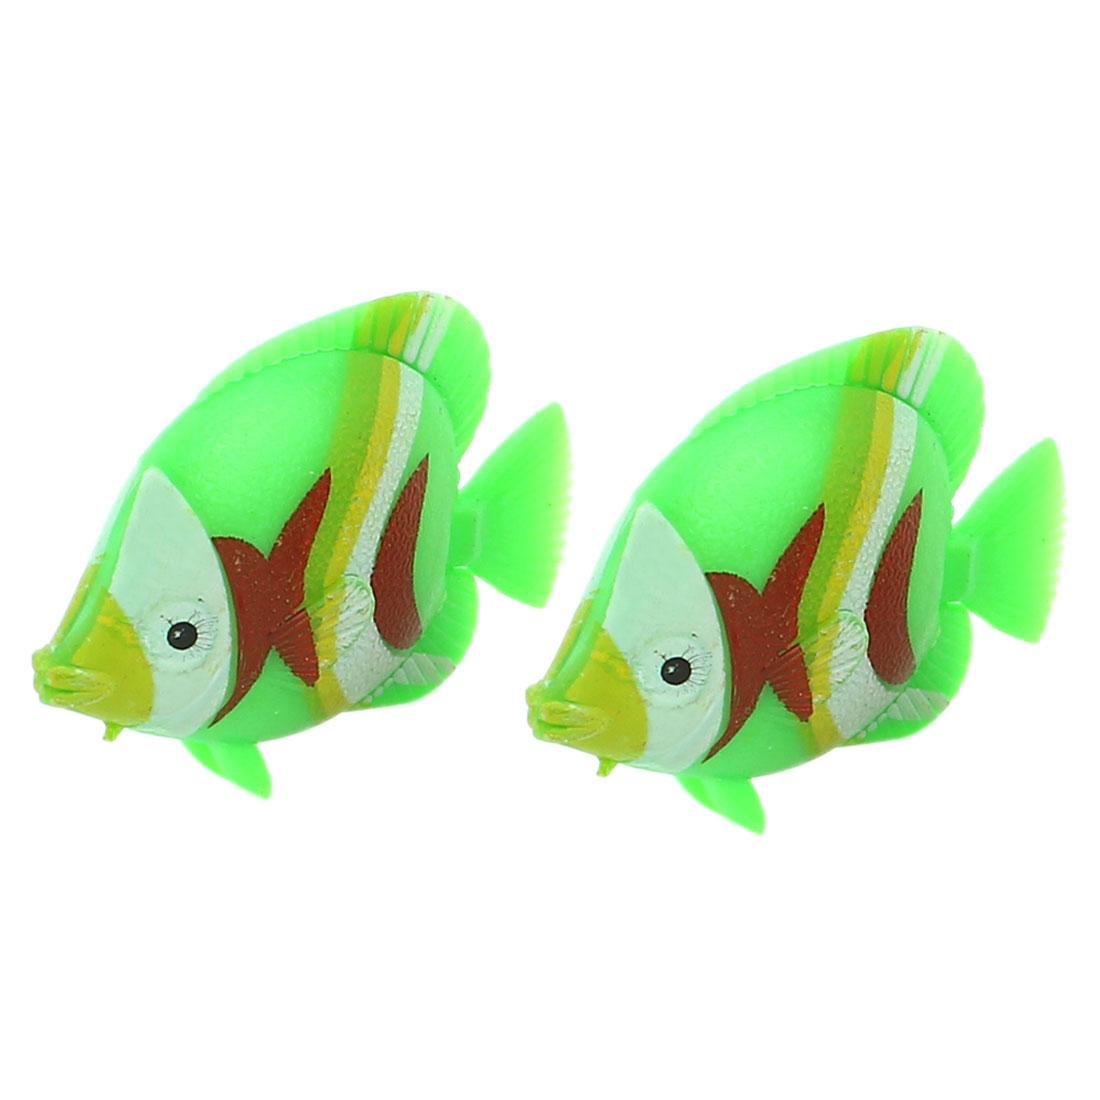 2Pcs Plastic Artificial Swing Tail Floating Fish Aquarium Decor Green